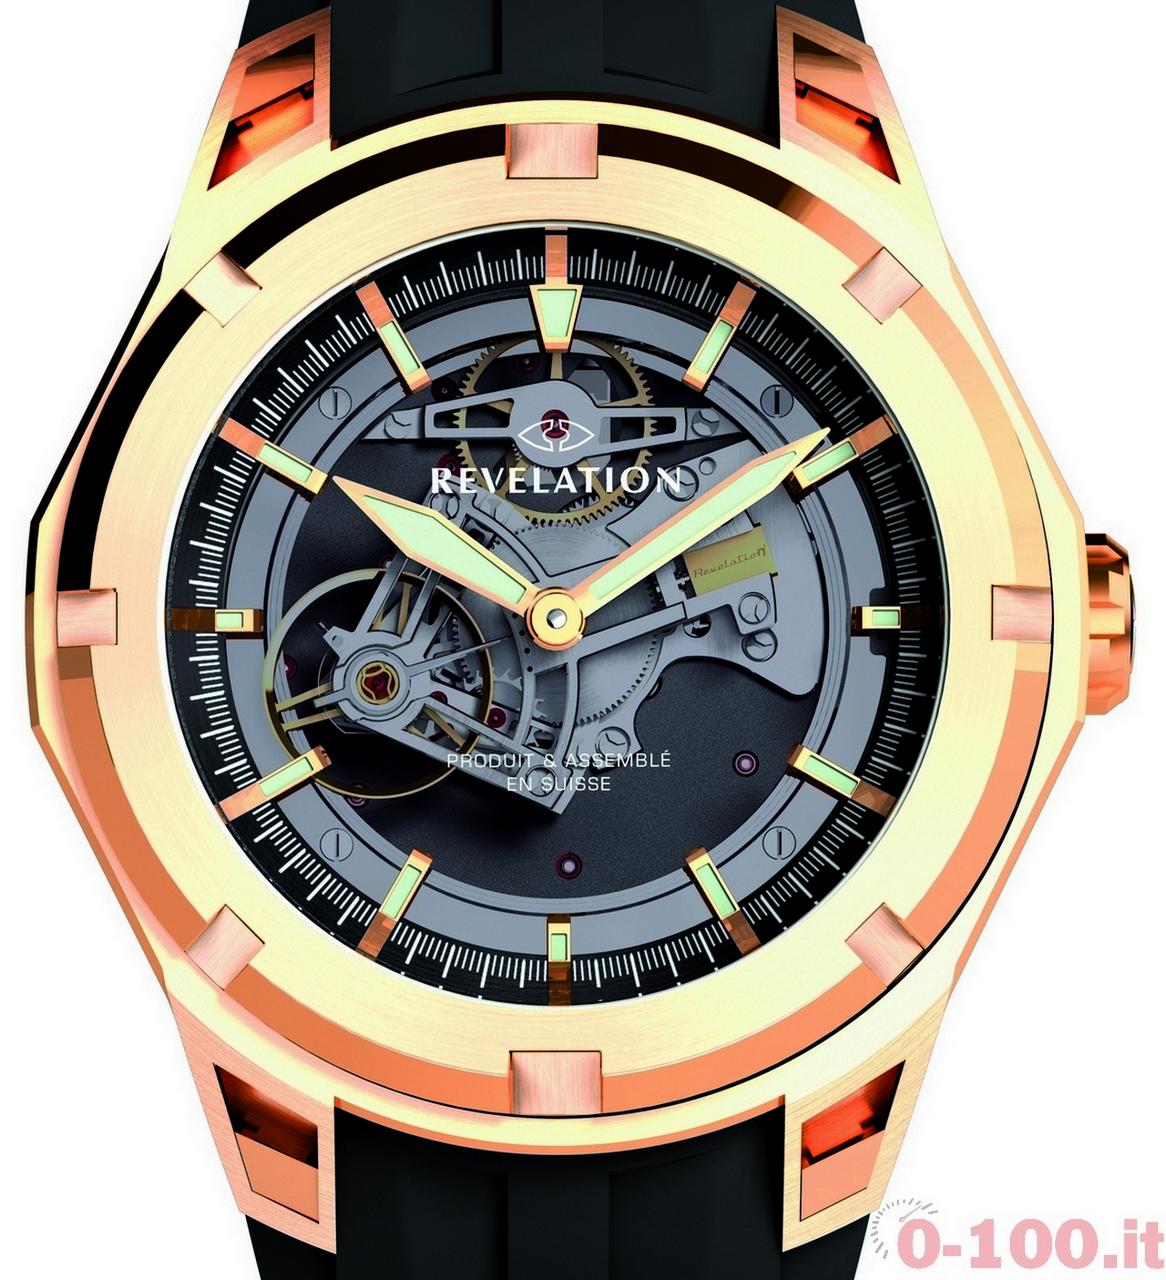 anteprima-baselworld-2014-revelation-r04-tourbillon-magical-watch-dial_0-1005